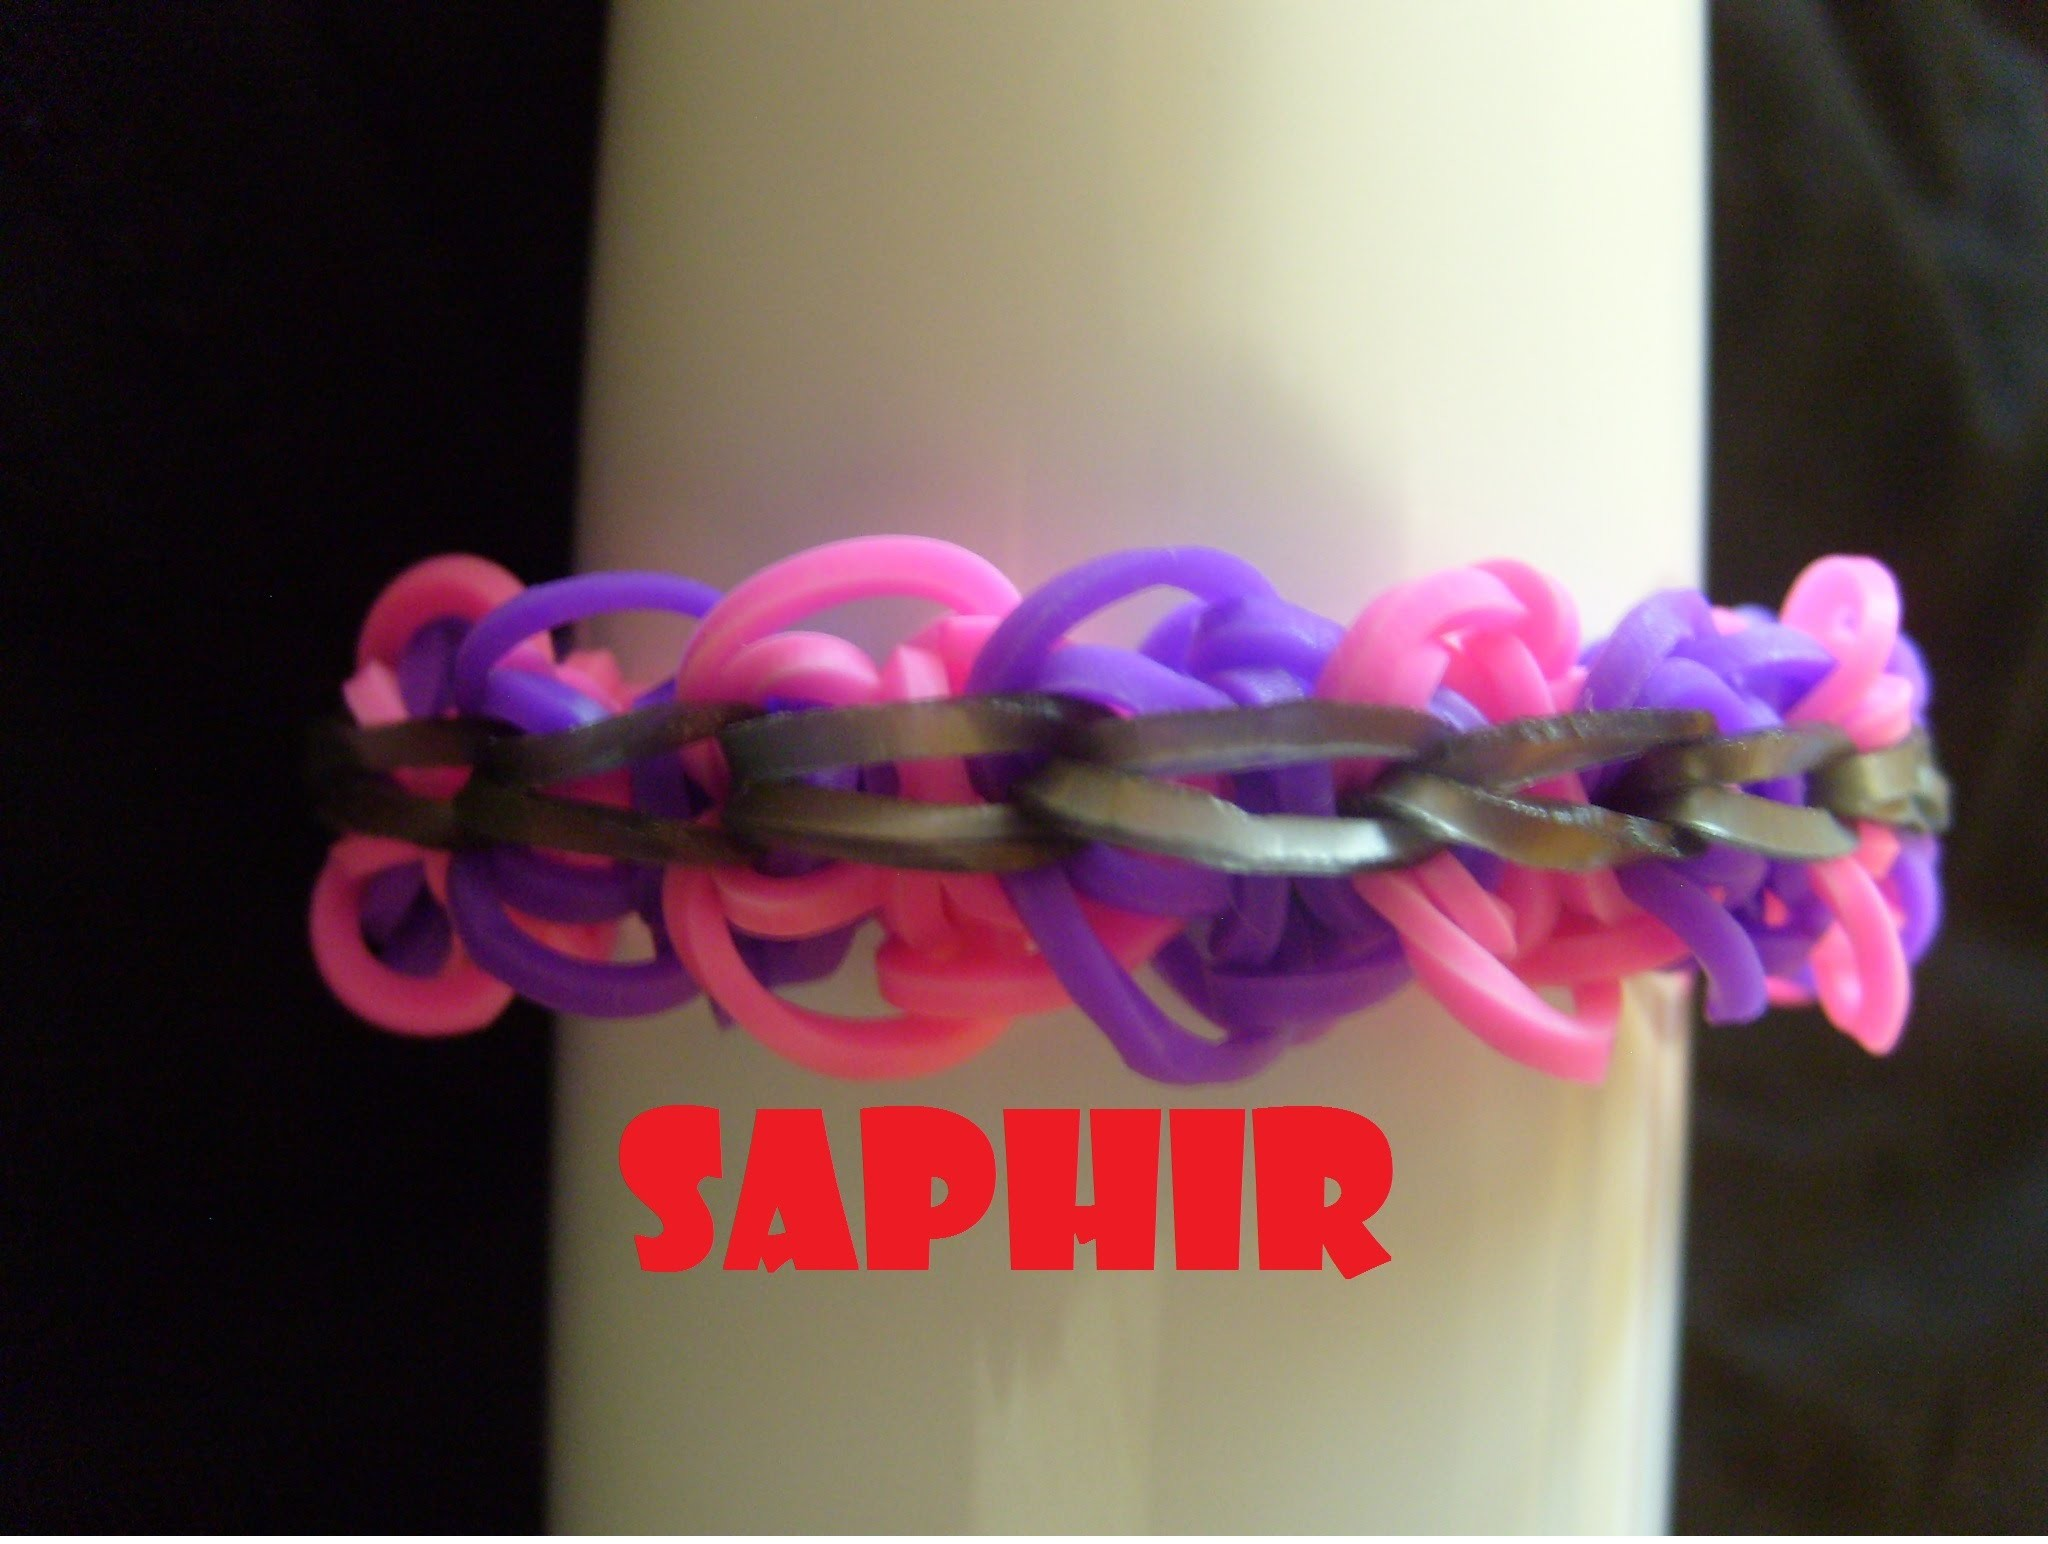 Bracelet elastique Saphir, tuto francais facile. Rainbow loom bands